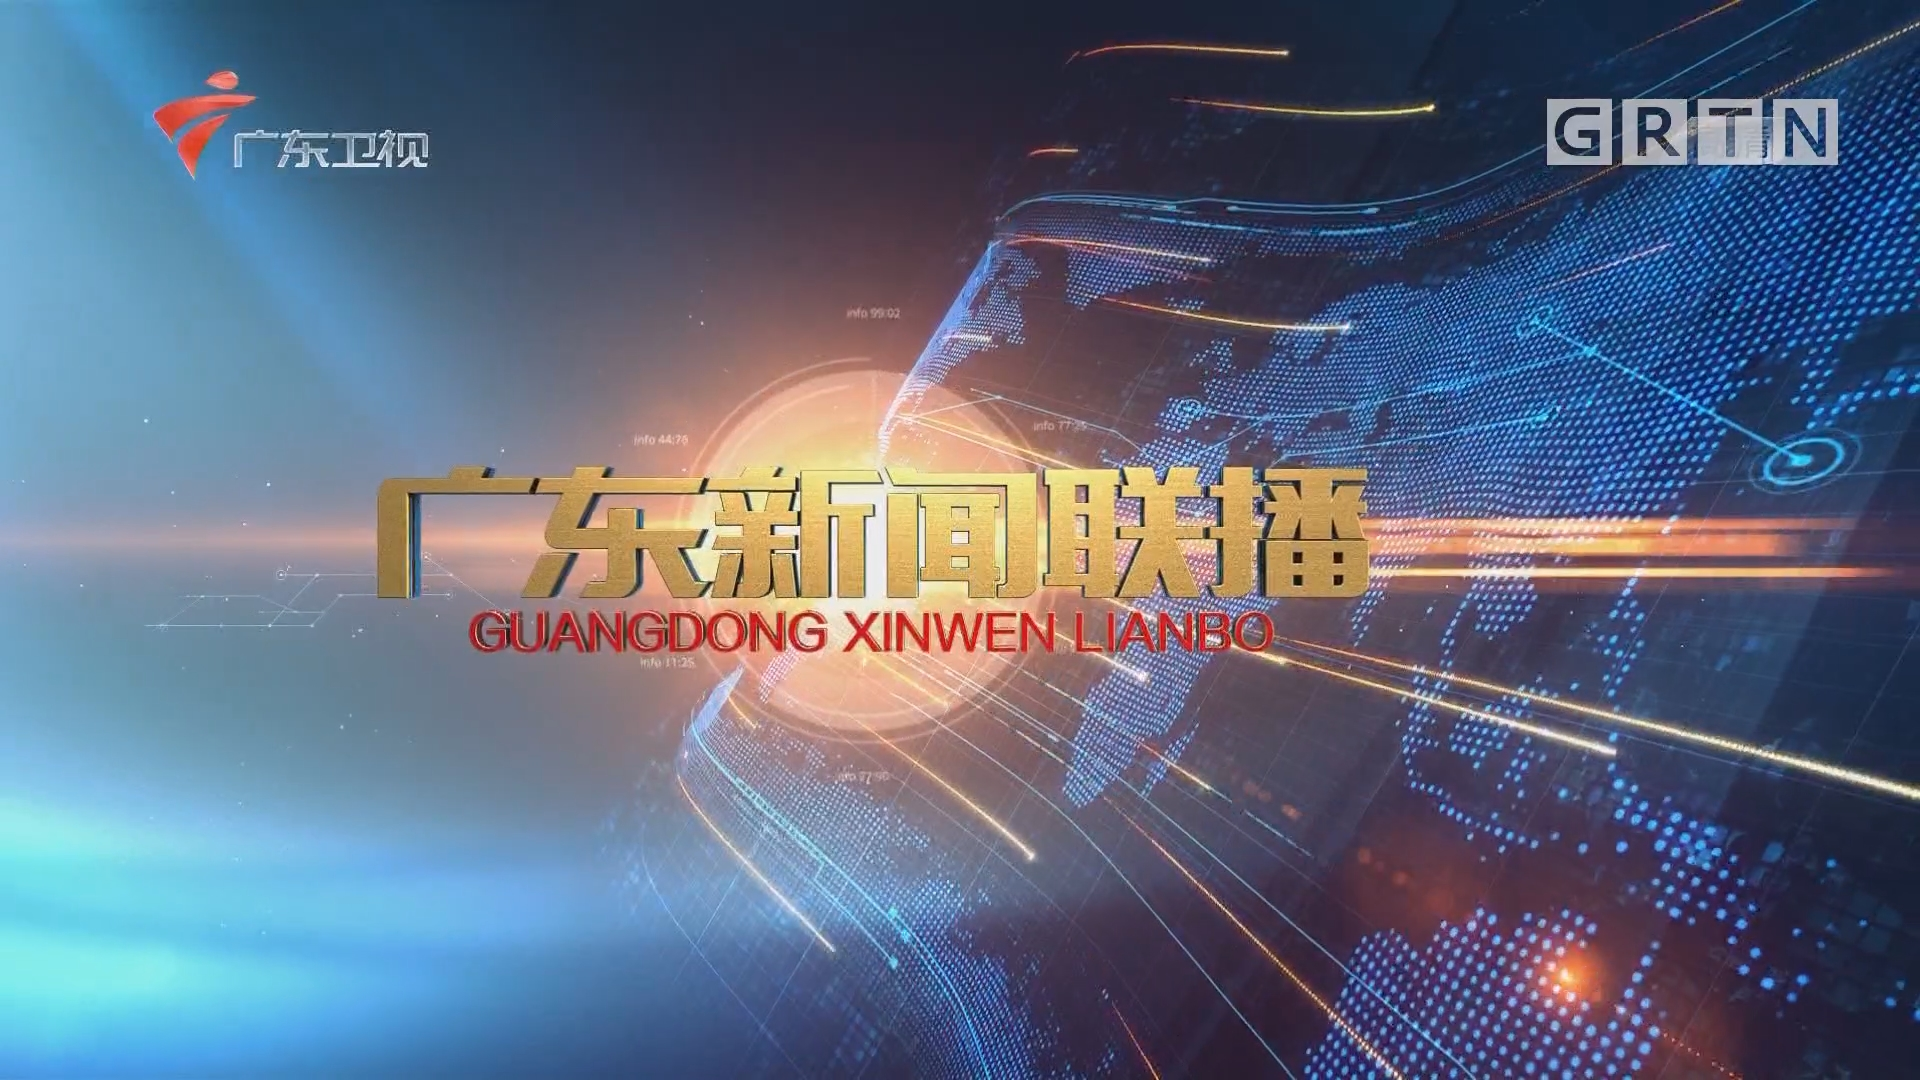 [HD][2018-12-08]广东新闻联播:深圳出台《若干措施》 更大力度支持民企发展